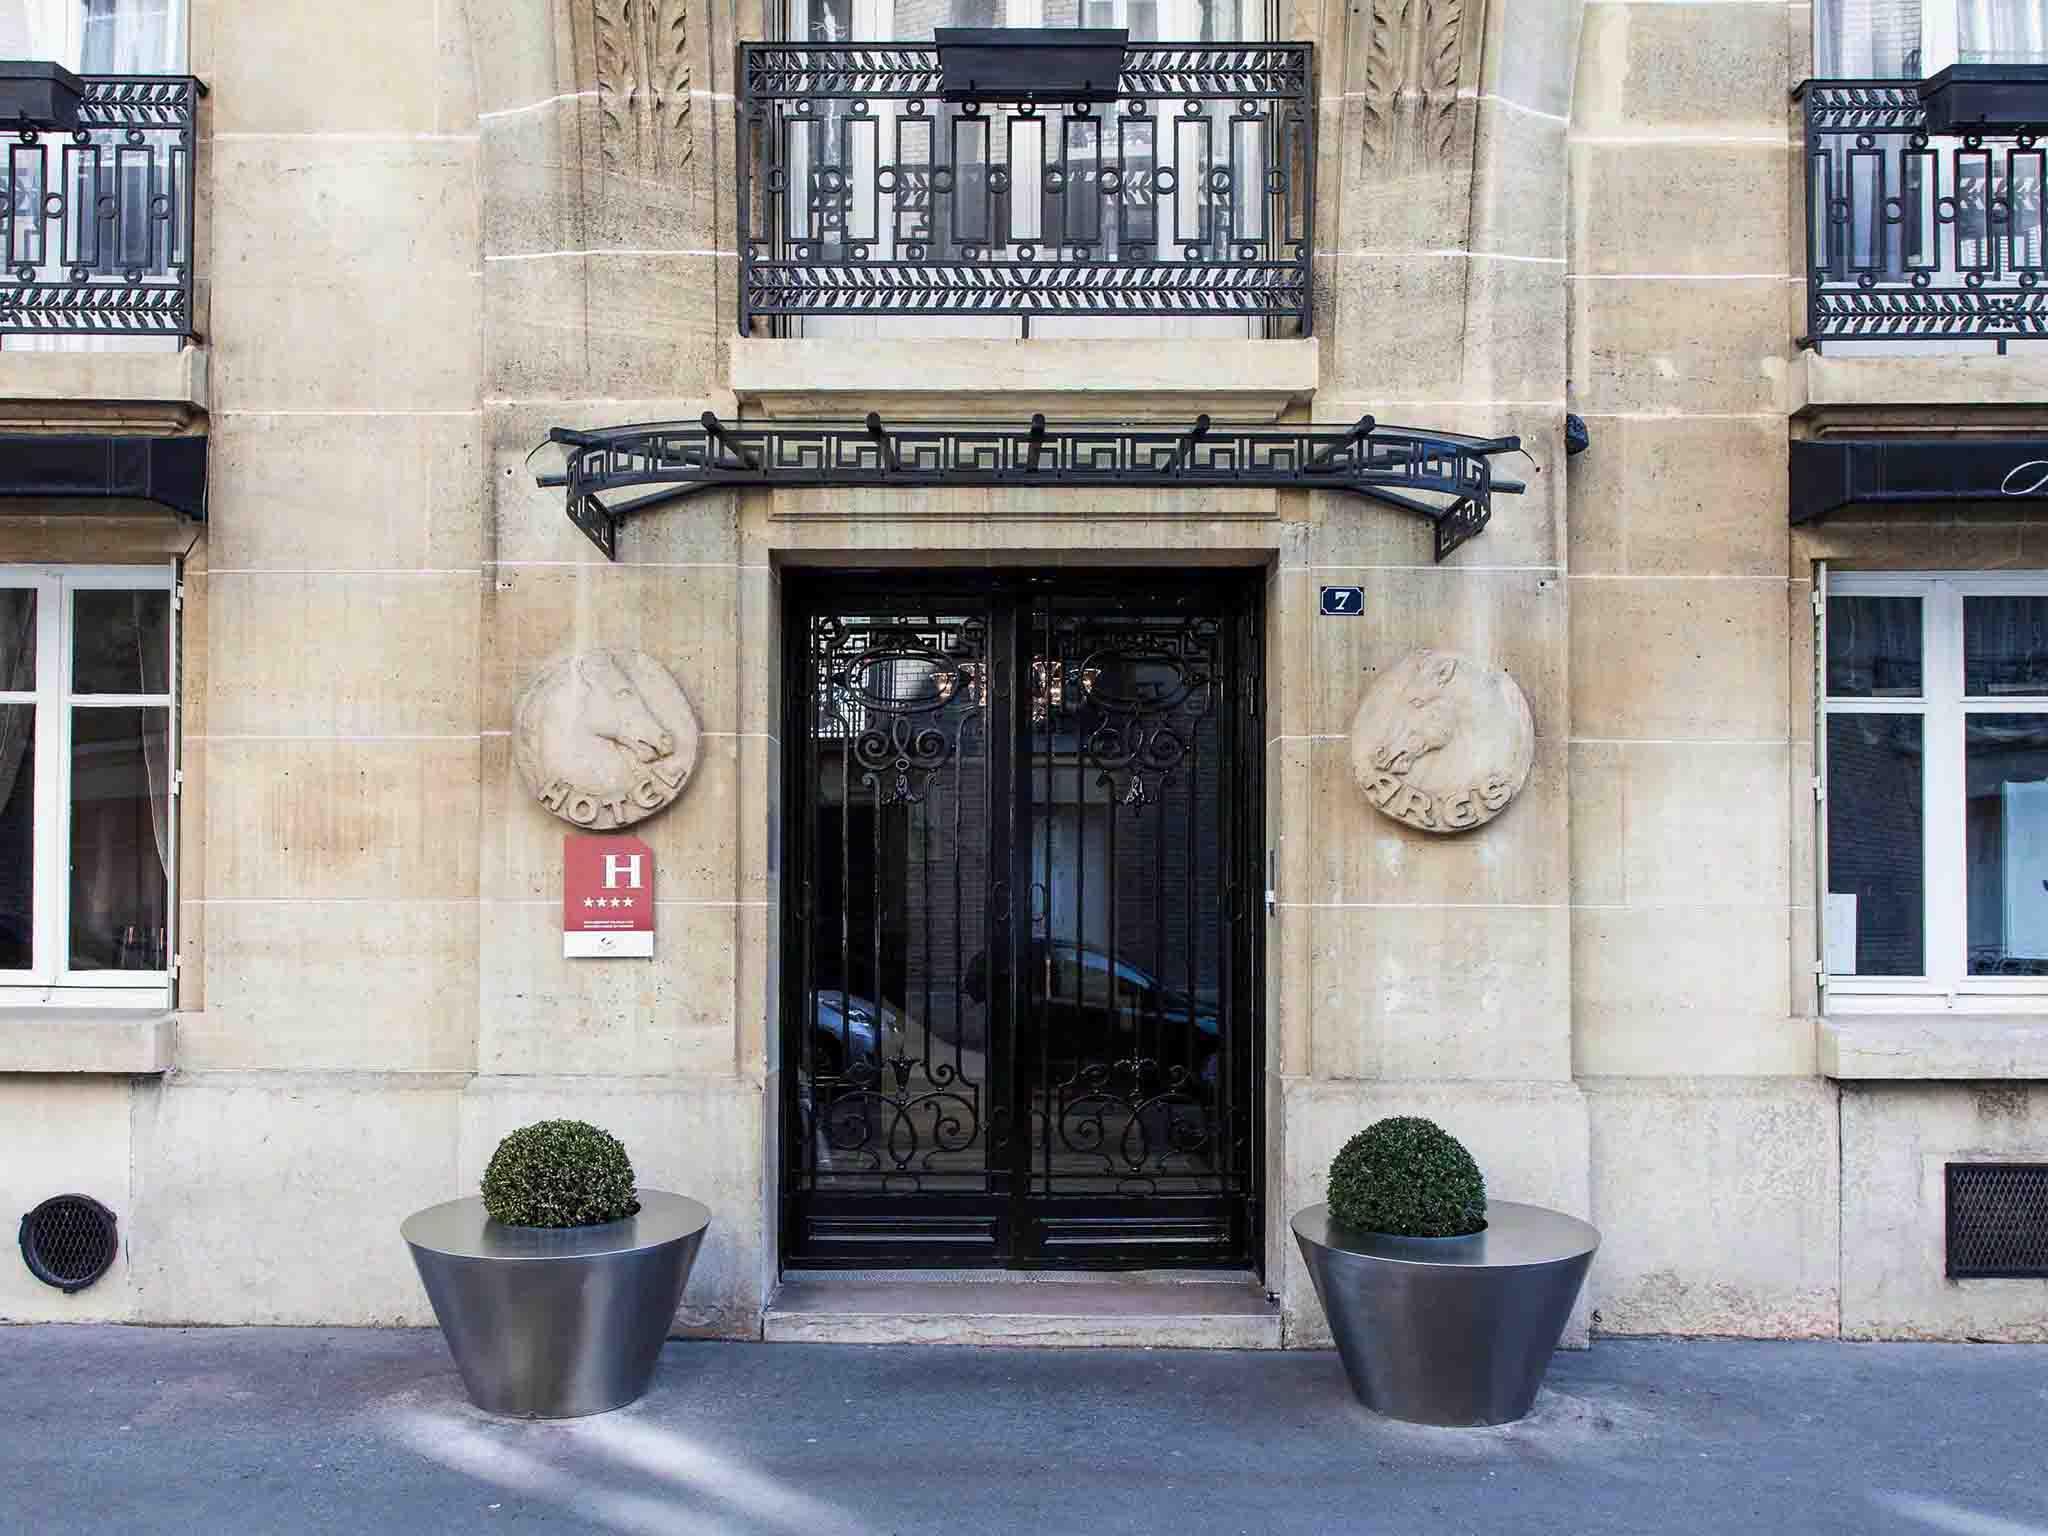 http://Hotel%20Ares%20Eiffel%20–%20โรงแรมหรูหราสไตล์บูติกในปารีส